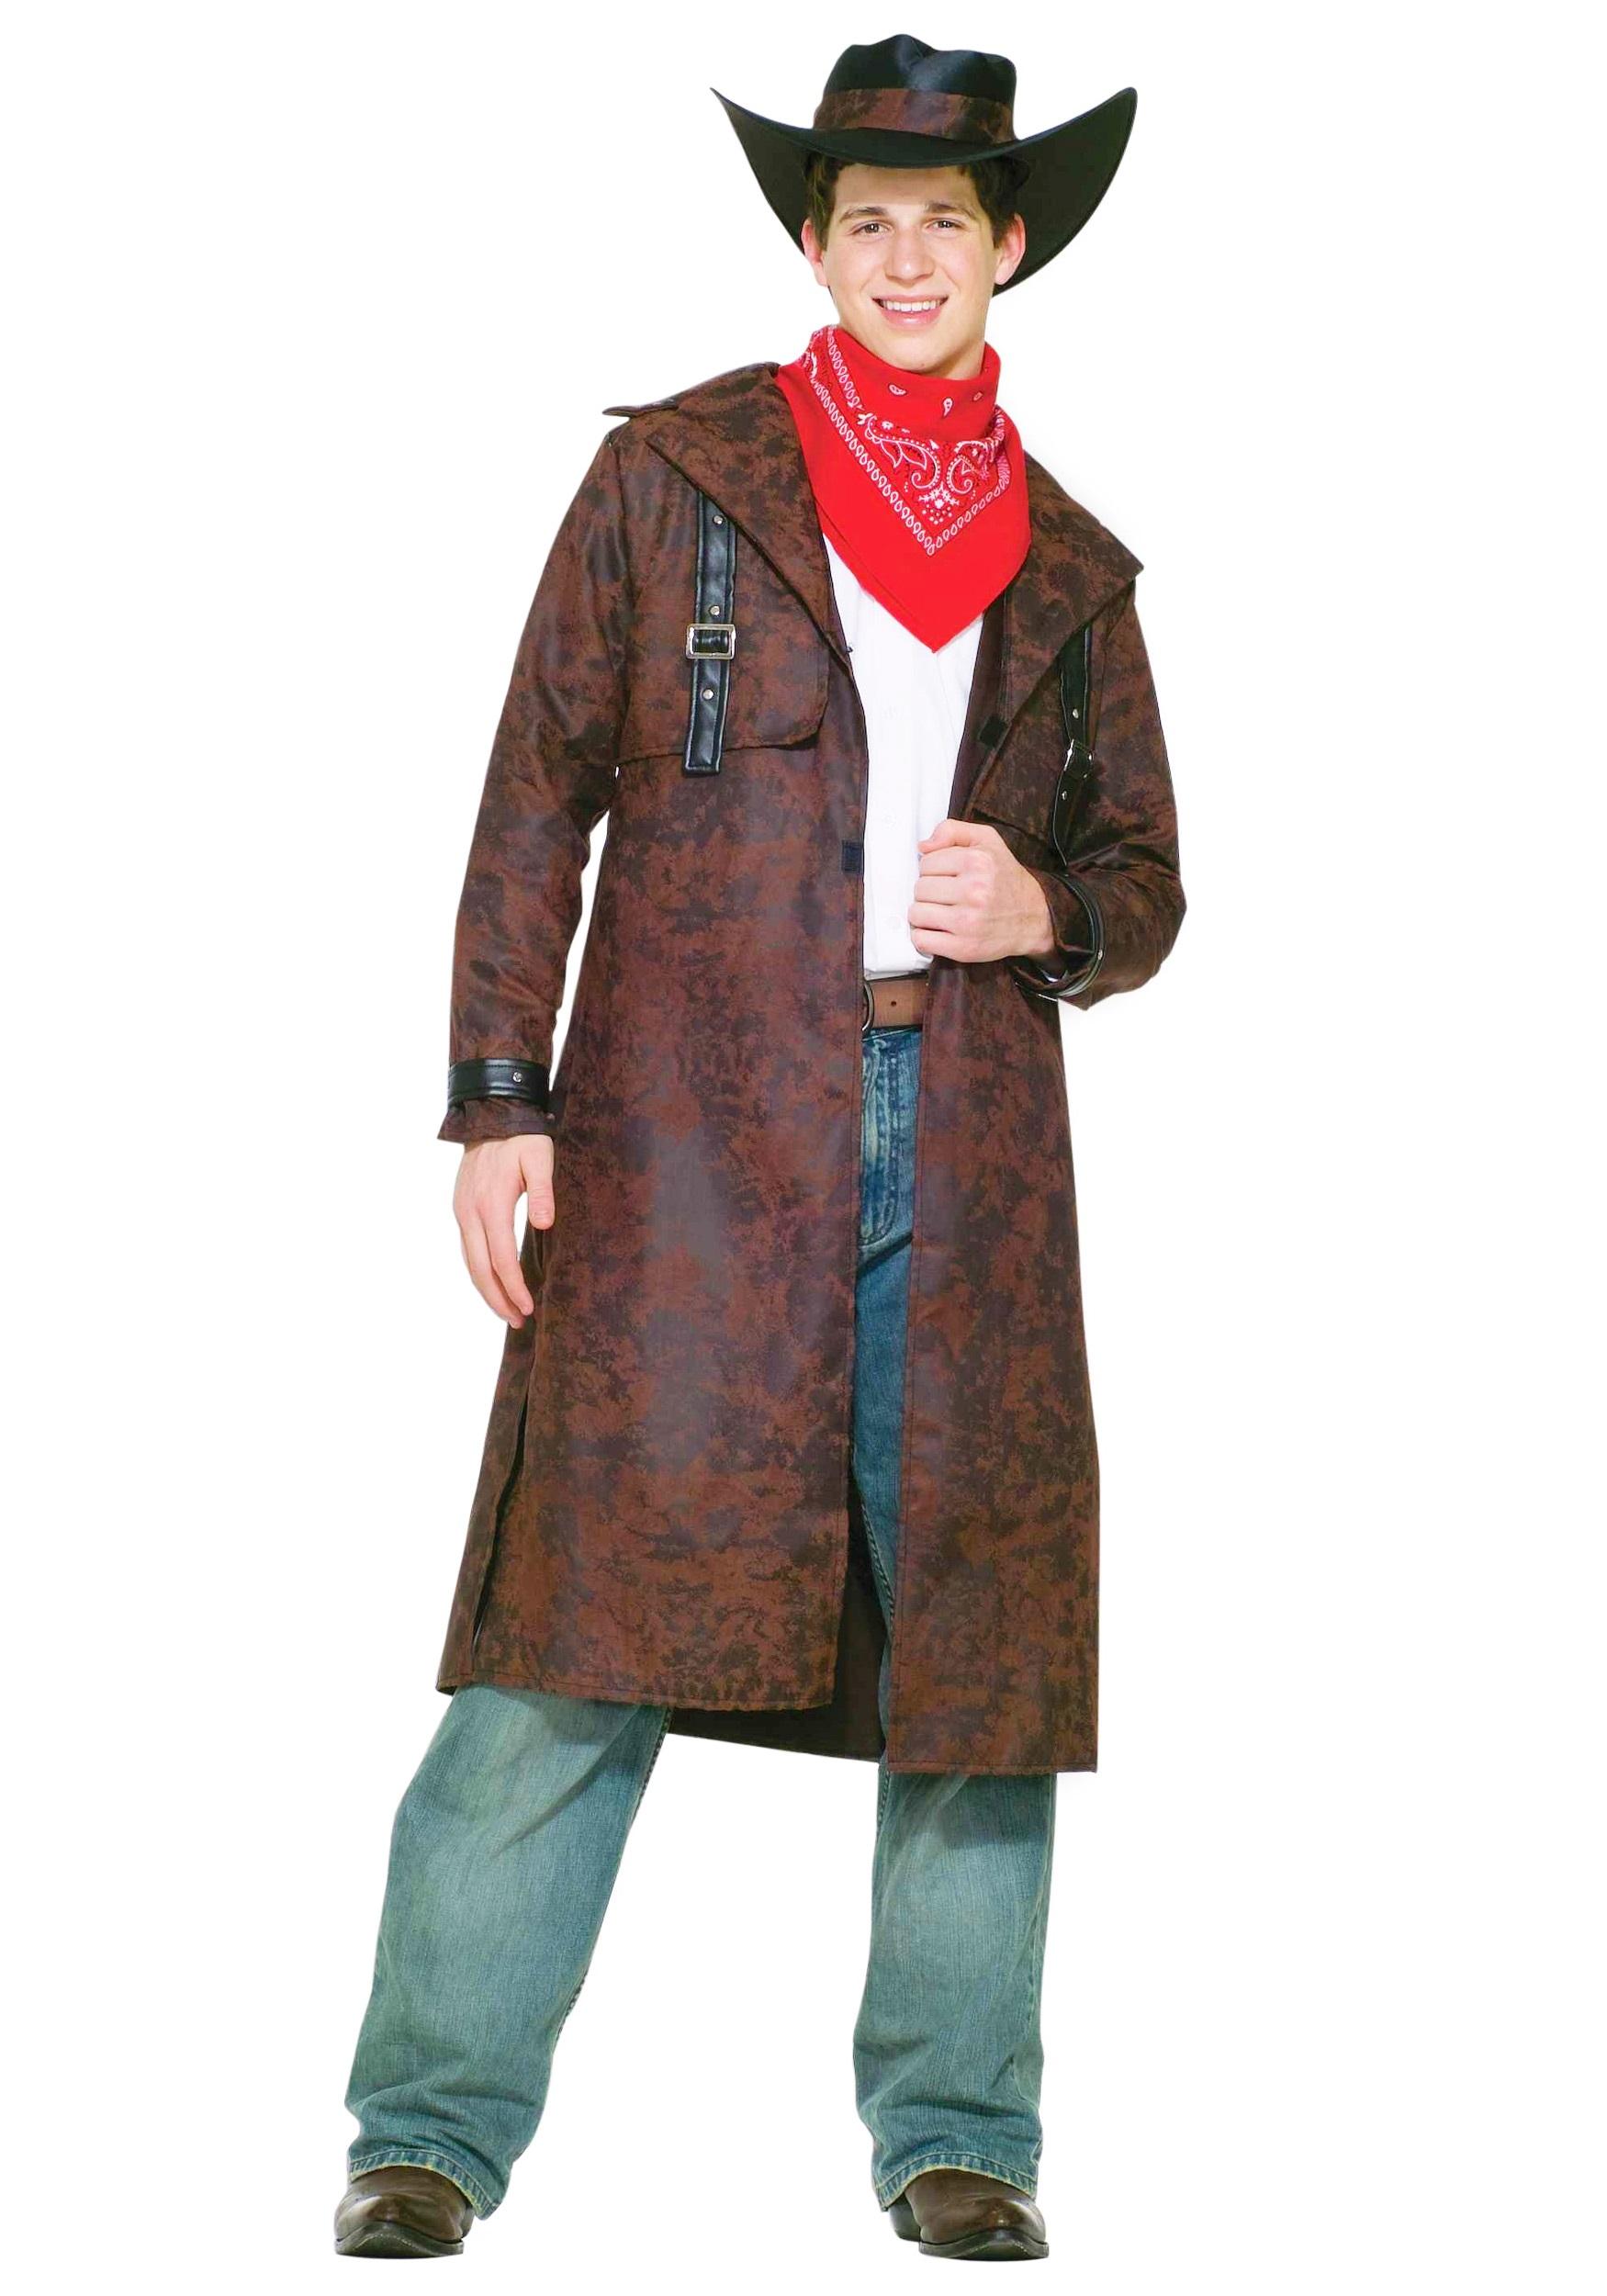 Teen Desperado Cowboy Costume - Halloween Costume Ideas 2019